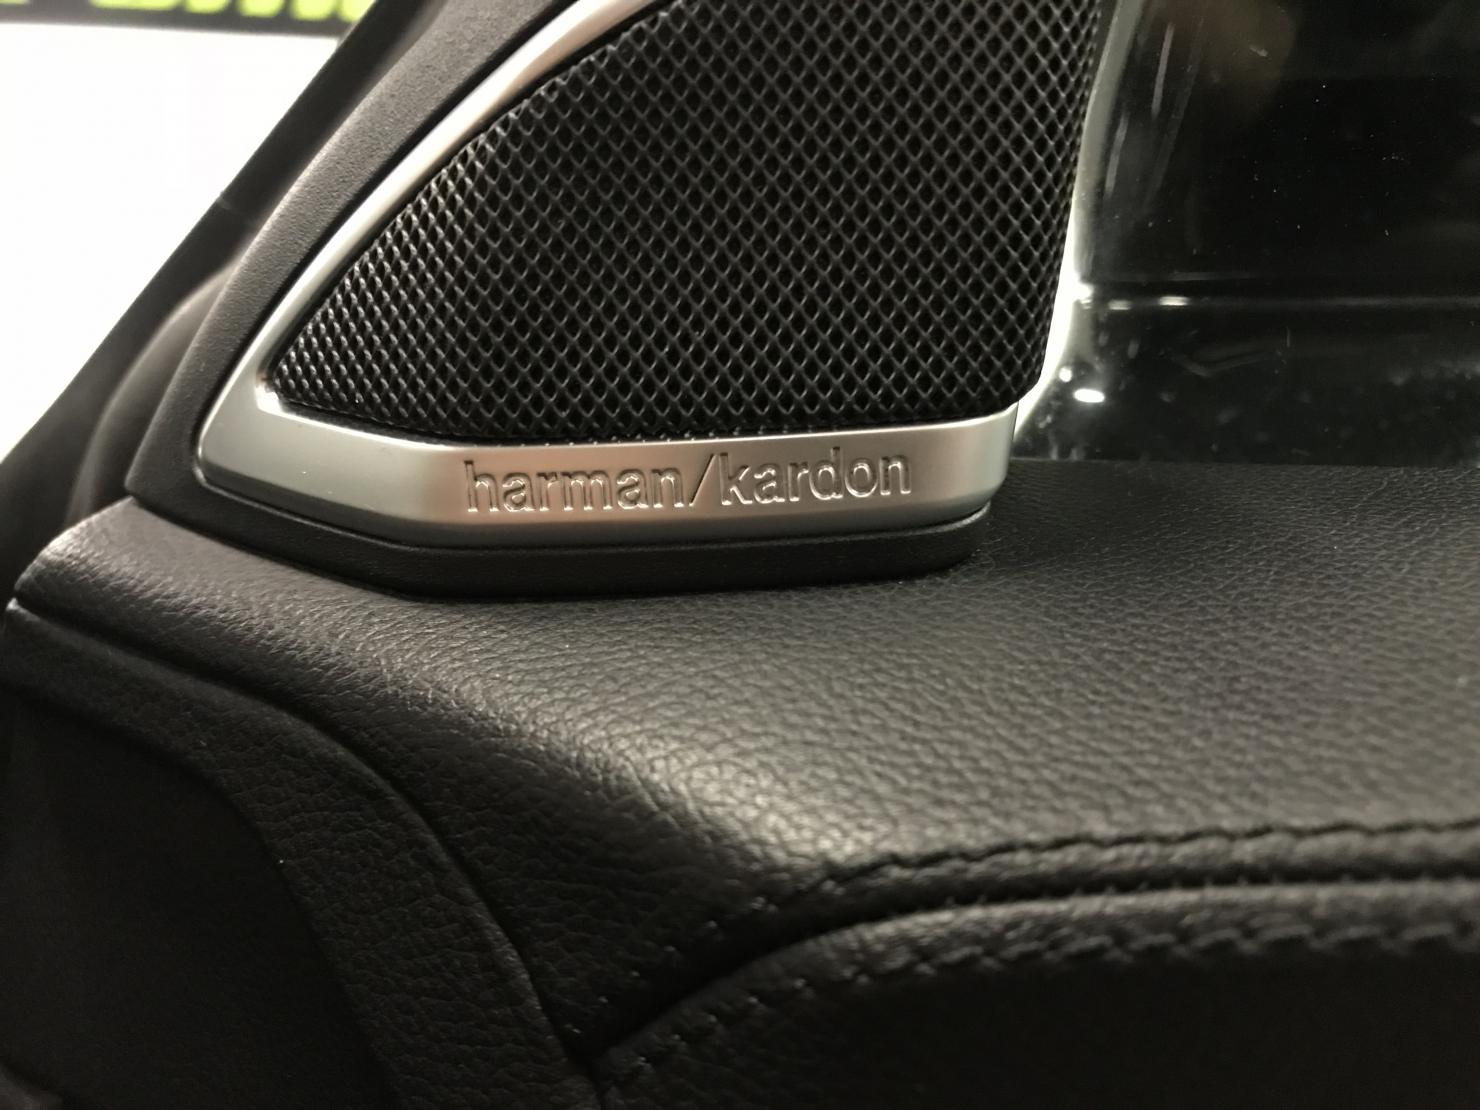 Mercedes Classe CLS Shooting break 350 3.0 V6 CDI 265cv Blueefficiency 7G-Tronic